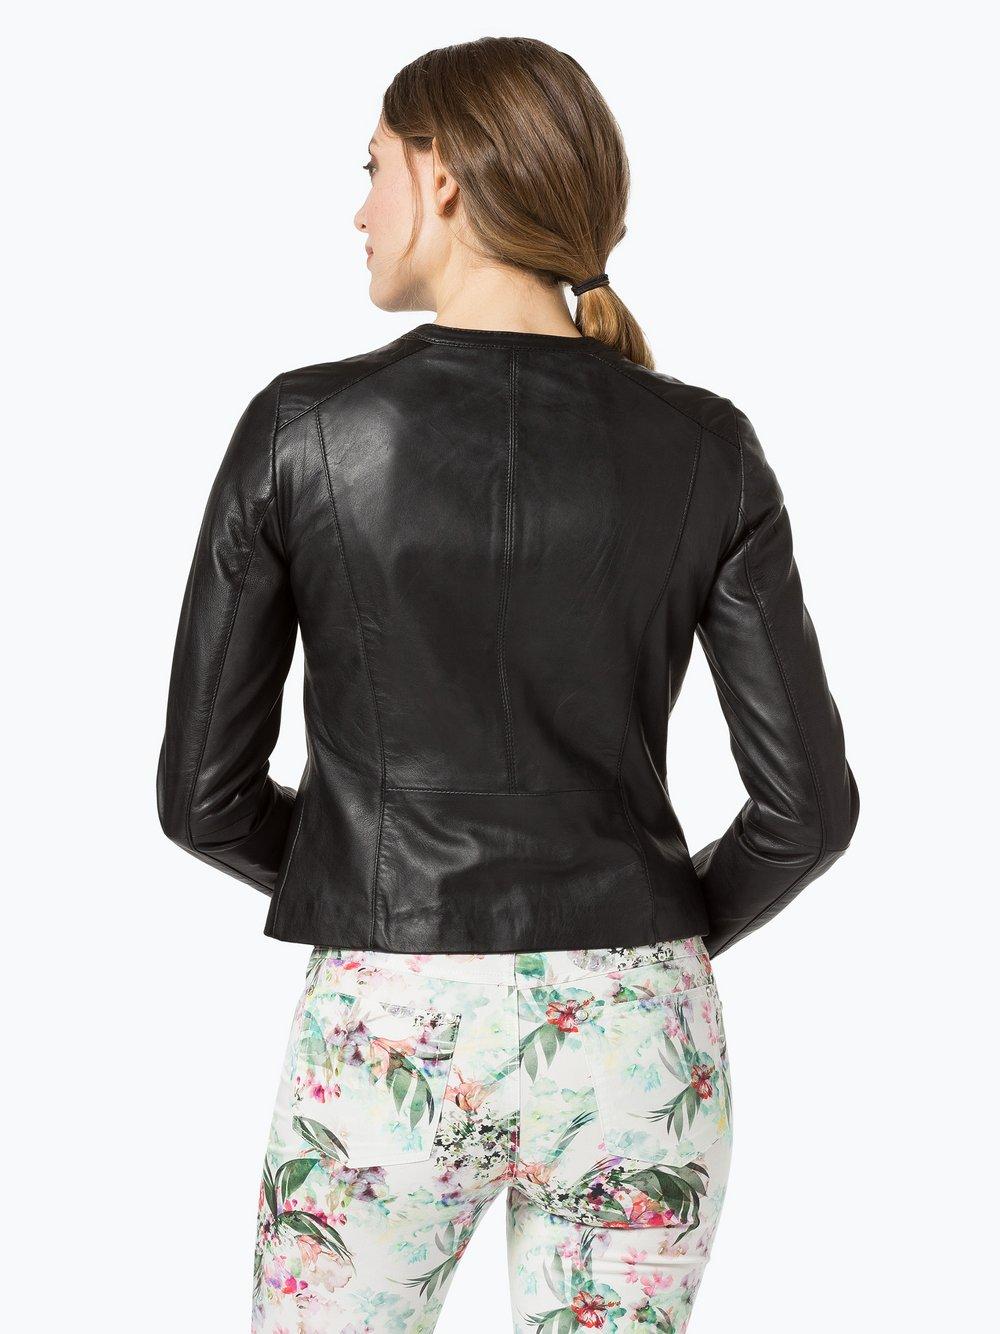 Esprit Collection Damen Esprit Lederjacke Schwarz Online